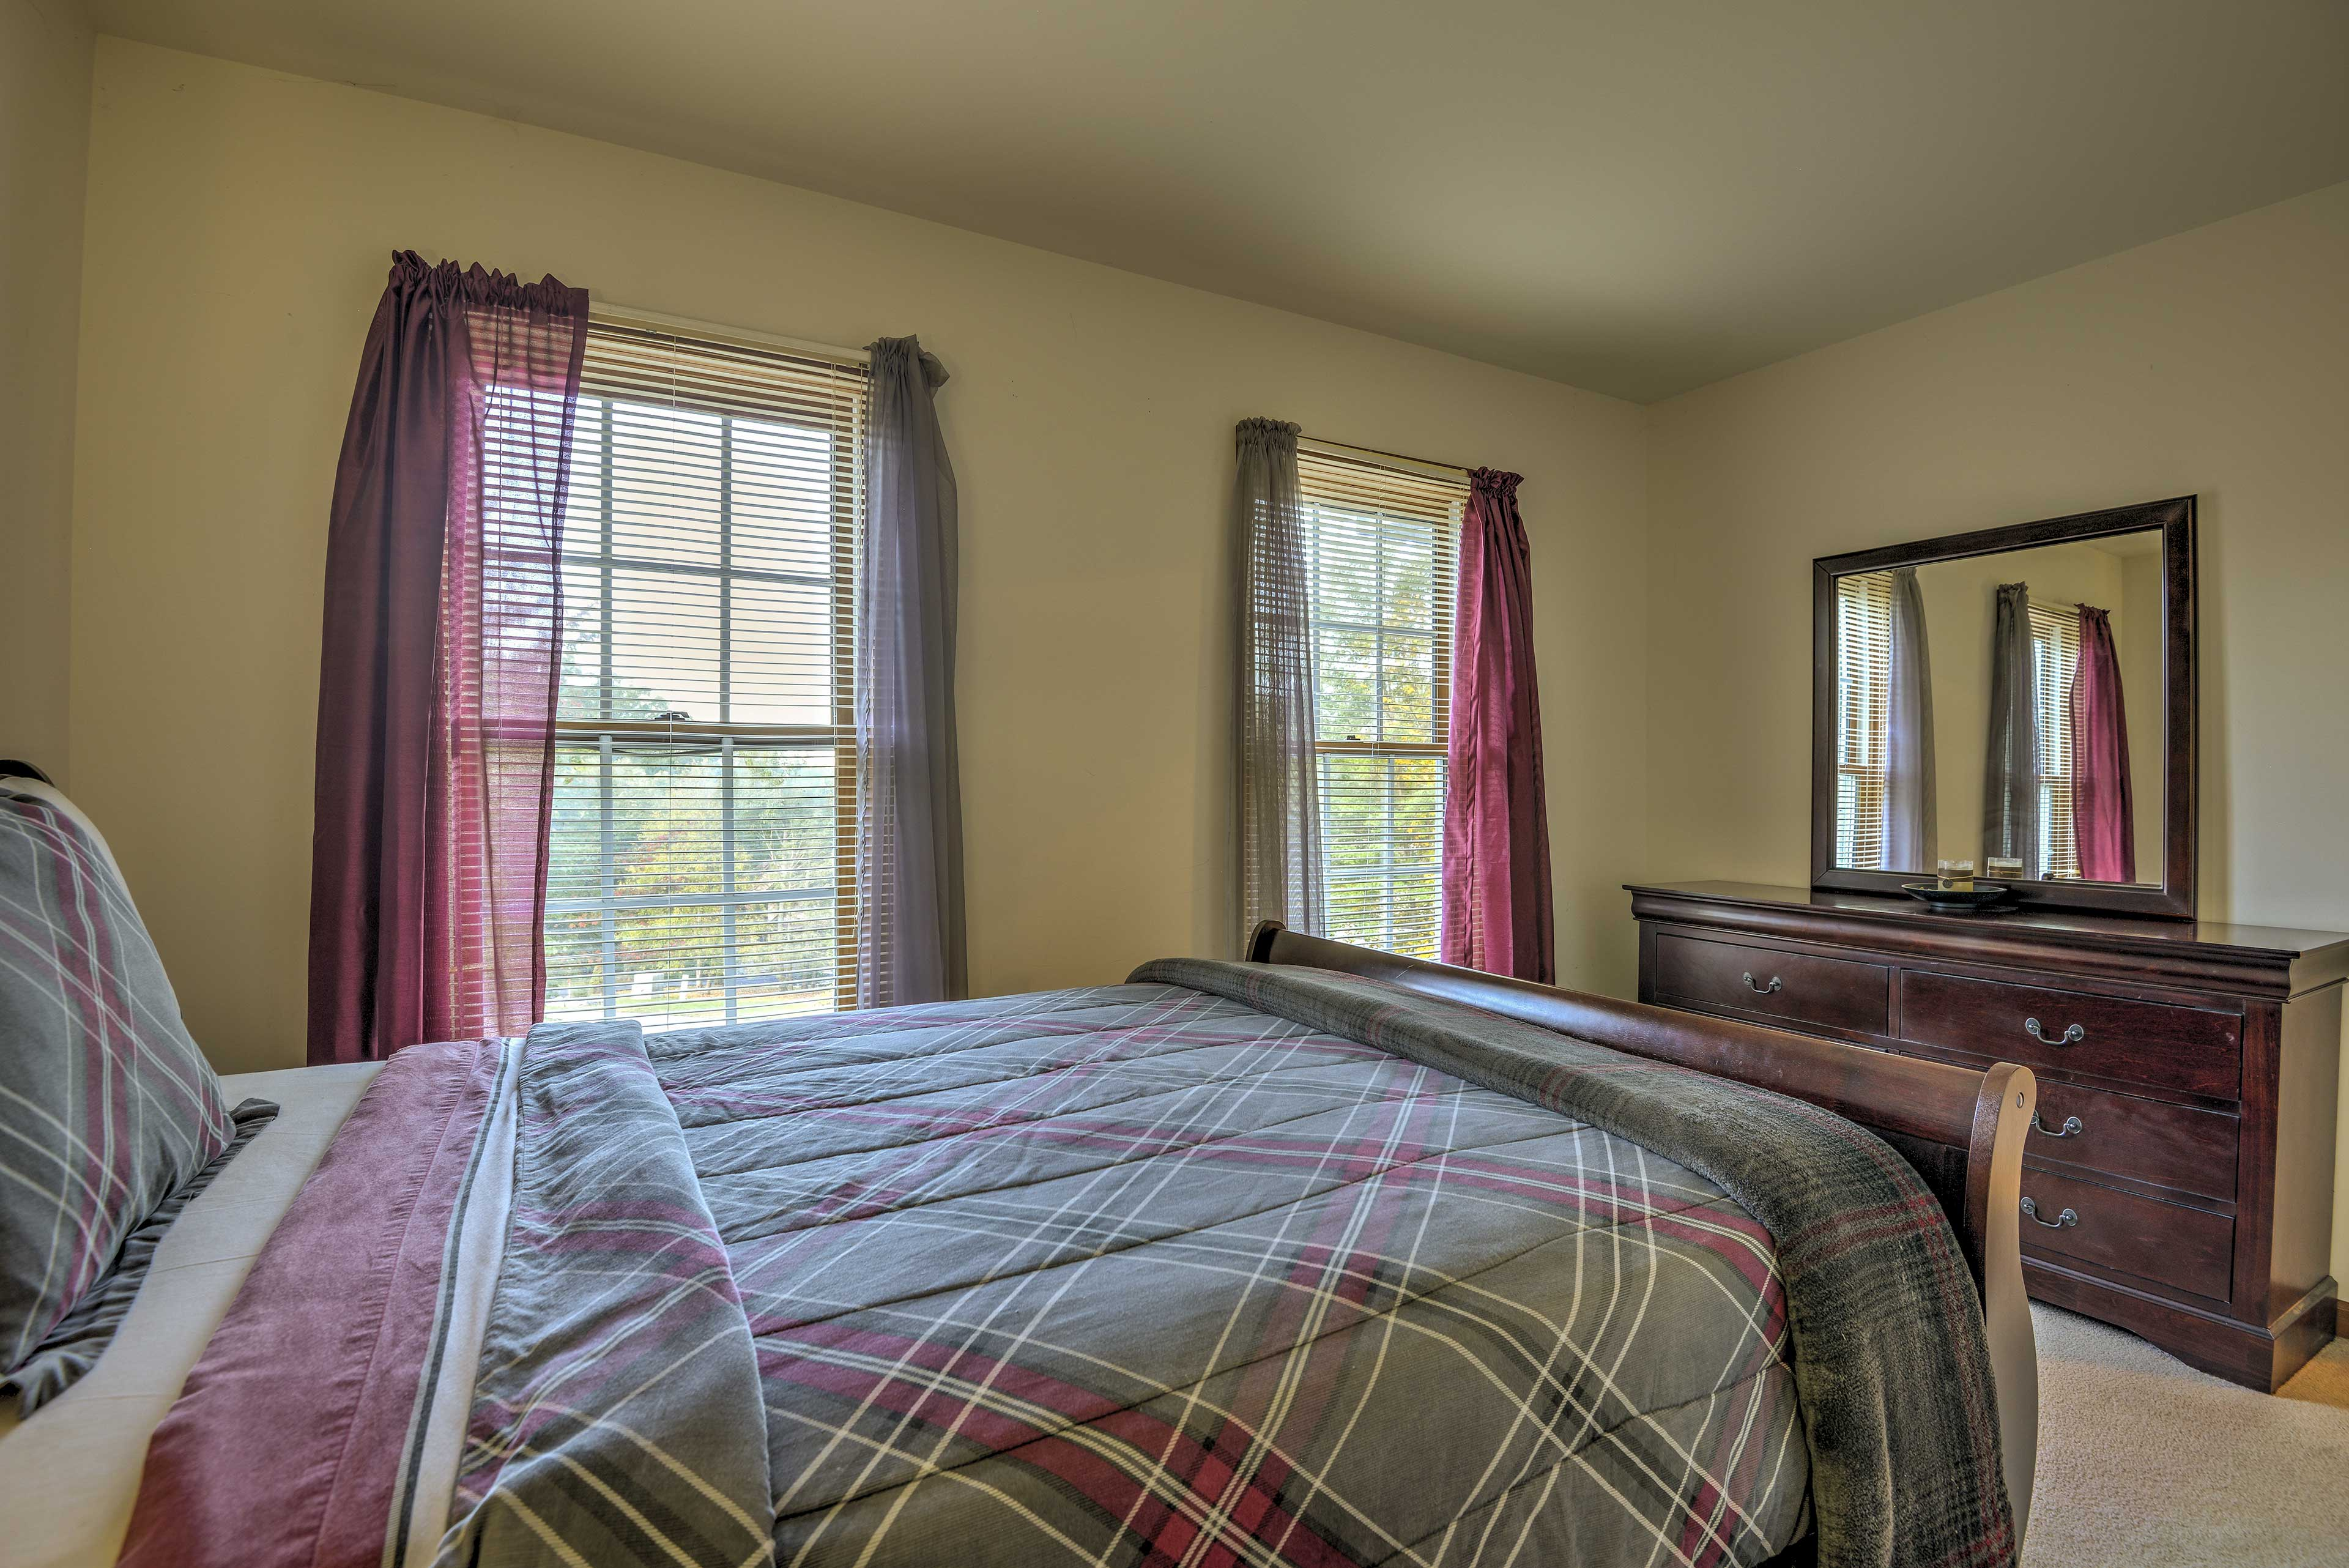 Bedroom   Linens Provided